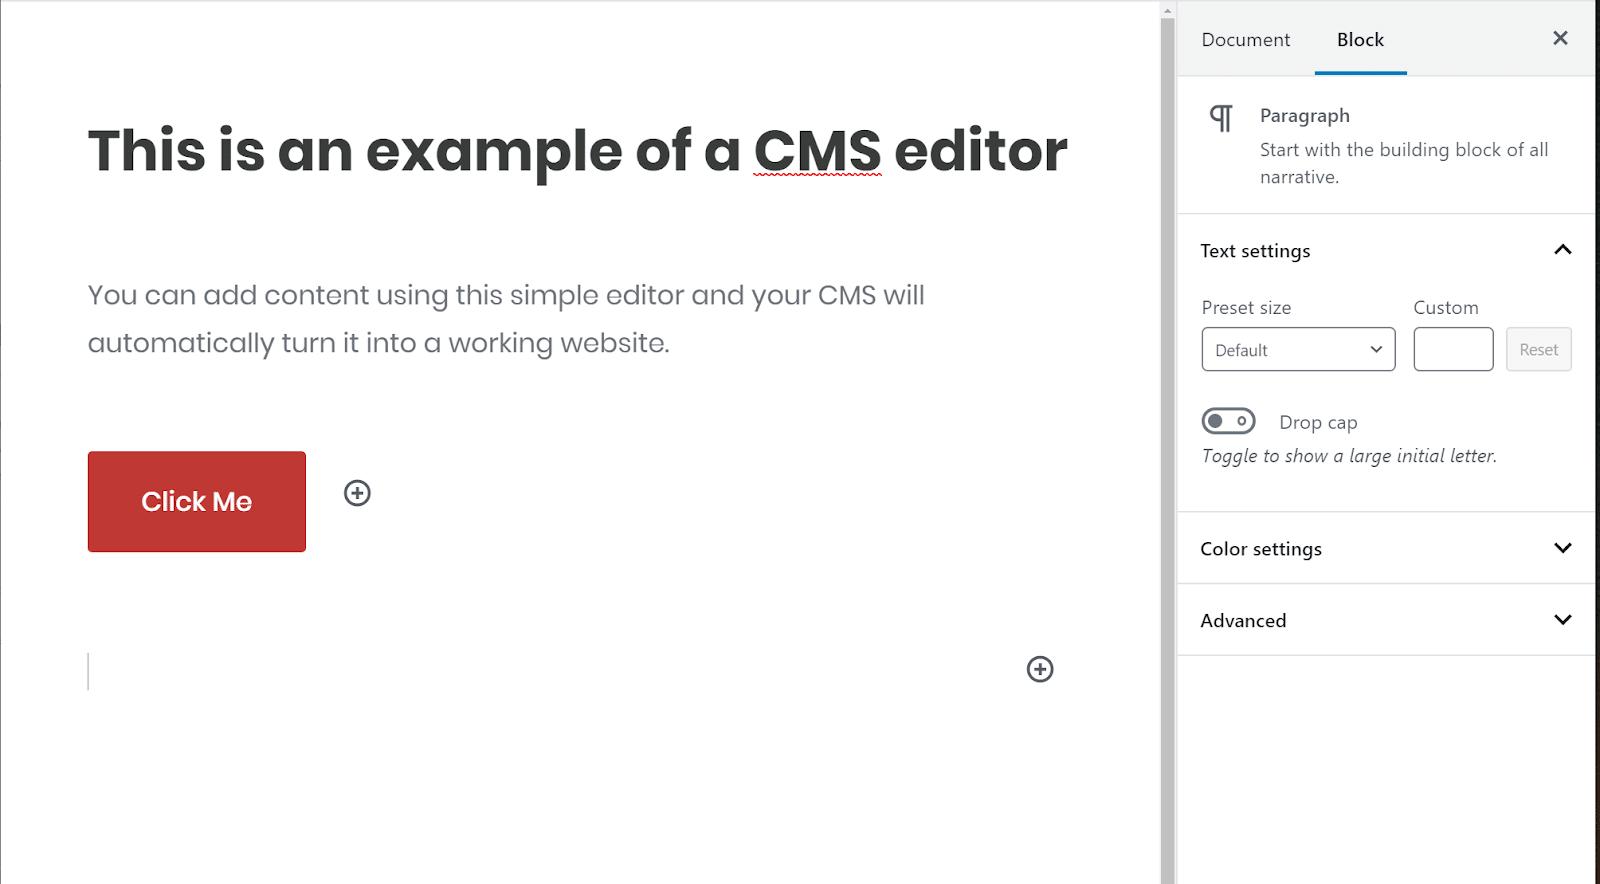 Ejemplo de editor de CMS